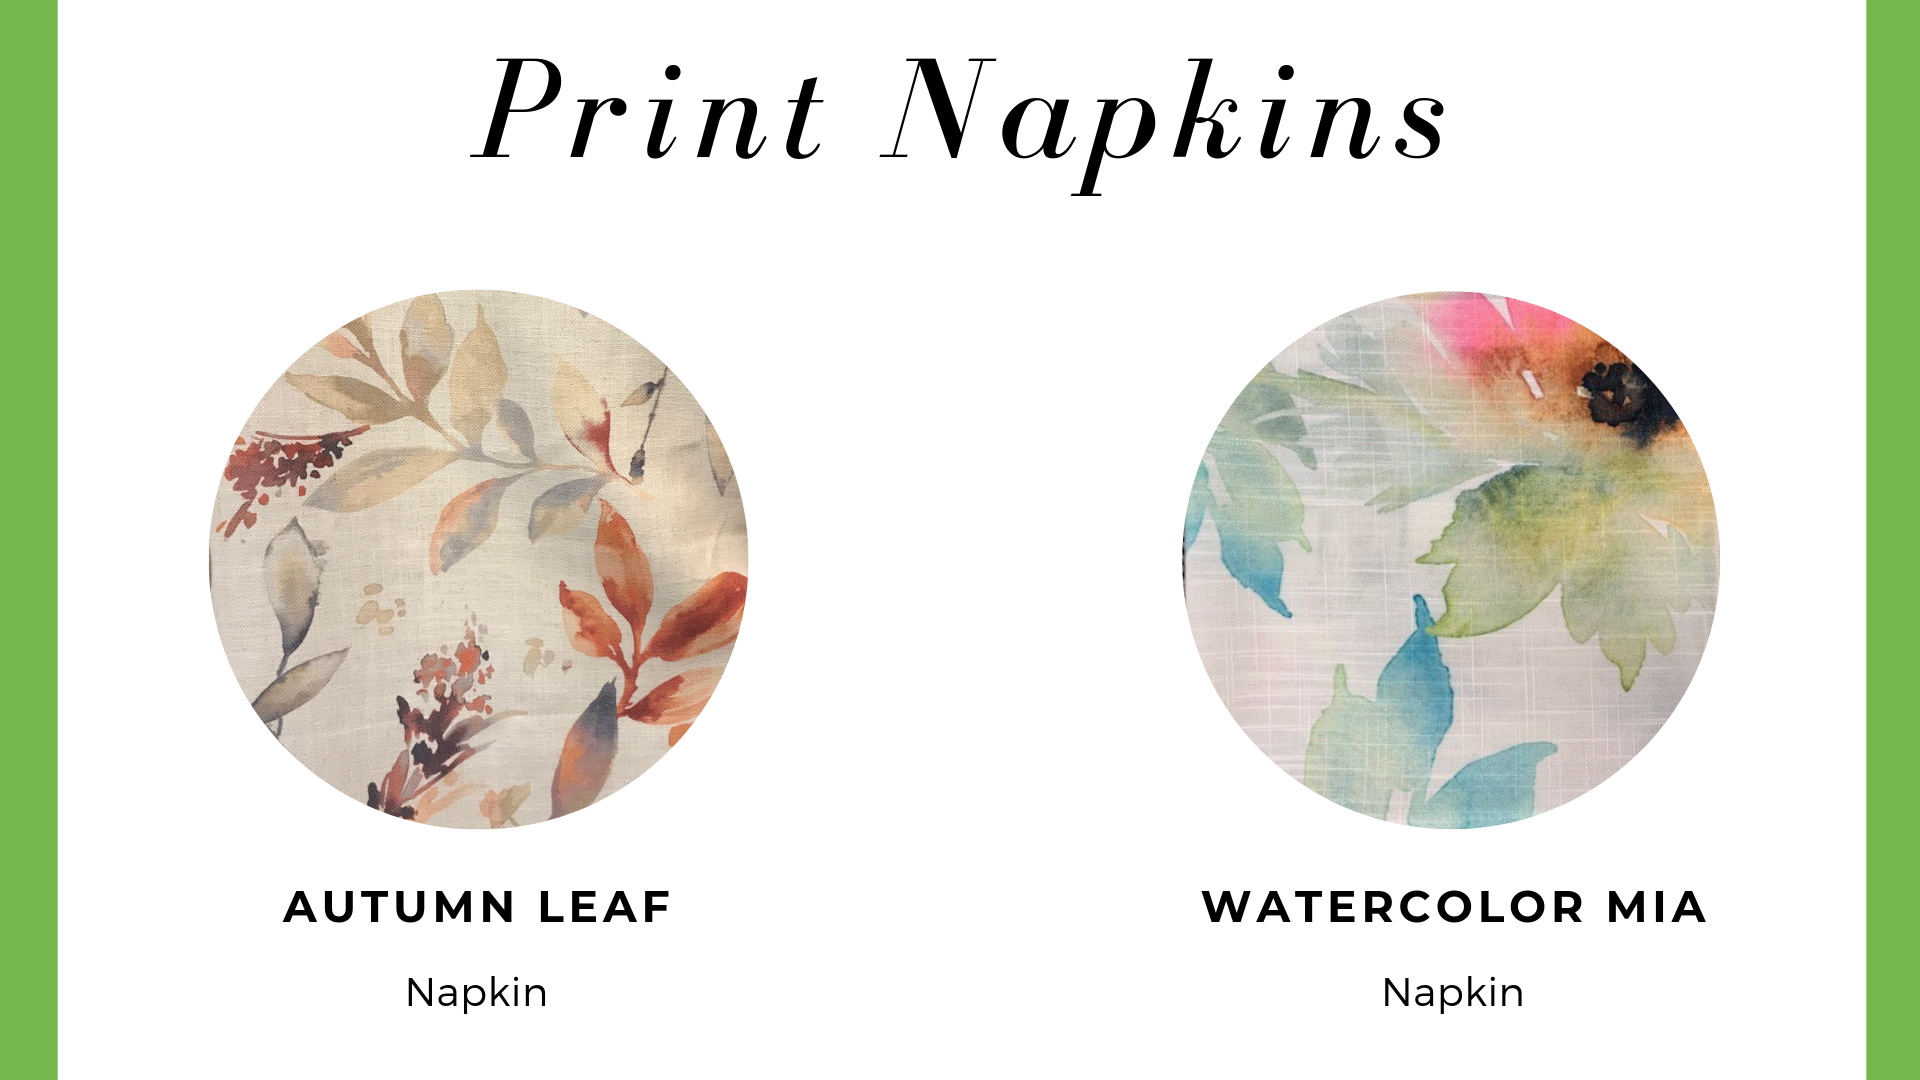 Print Napkins